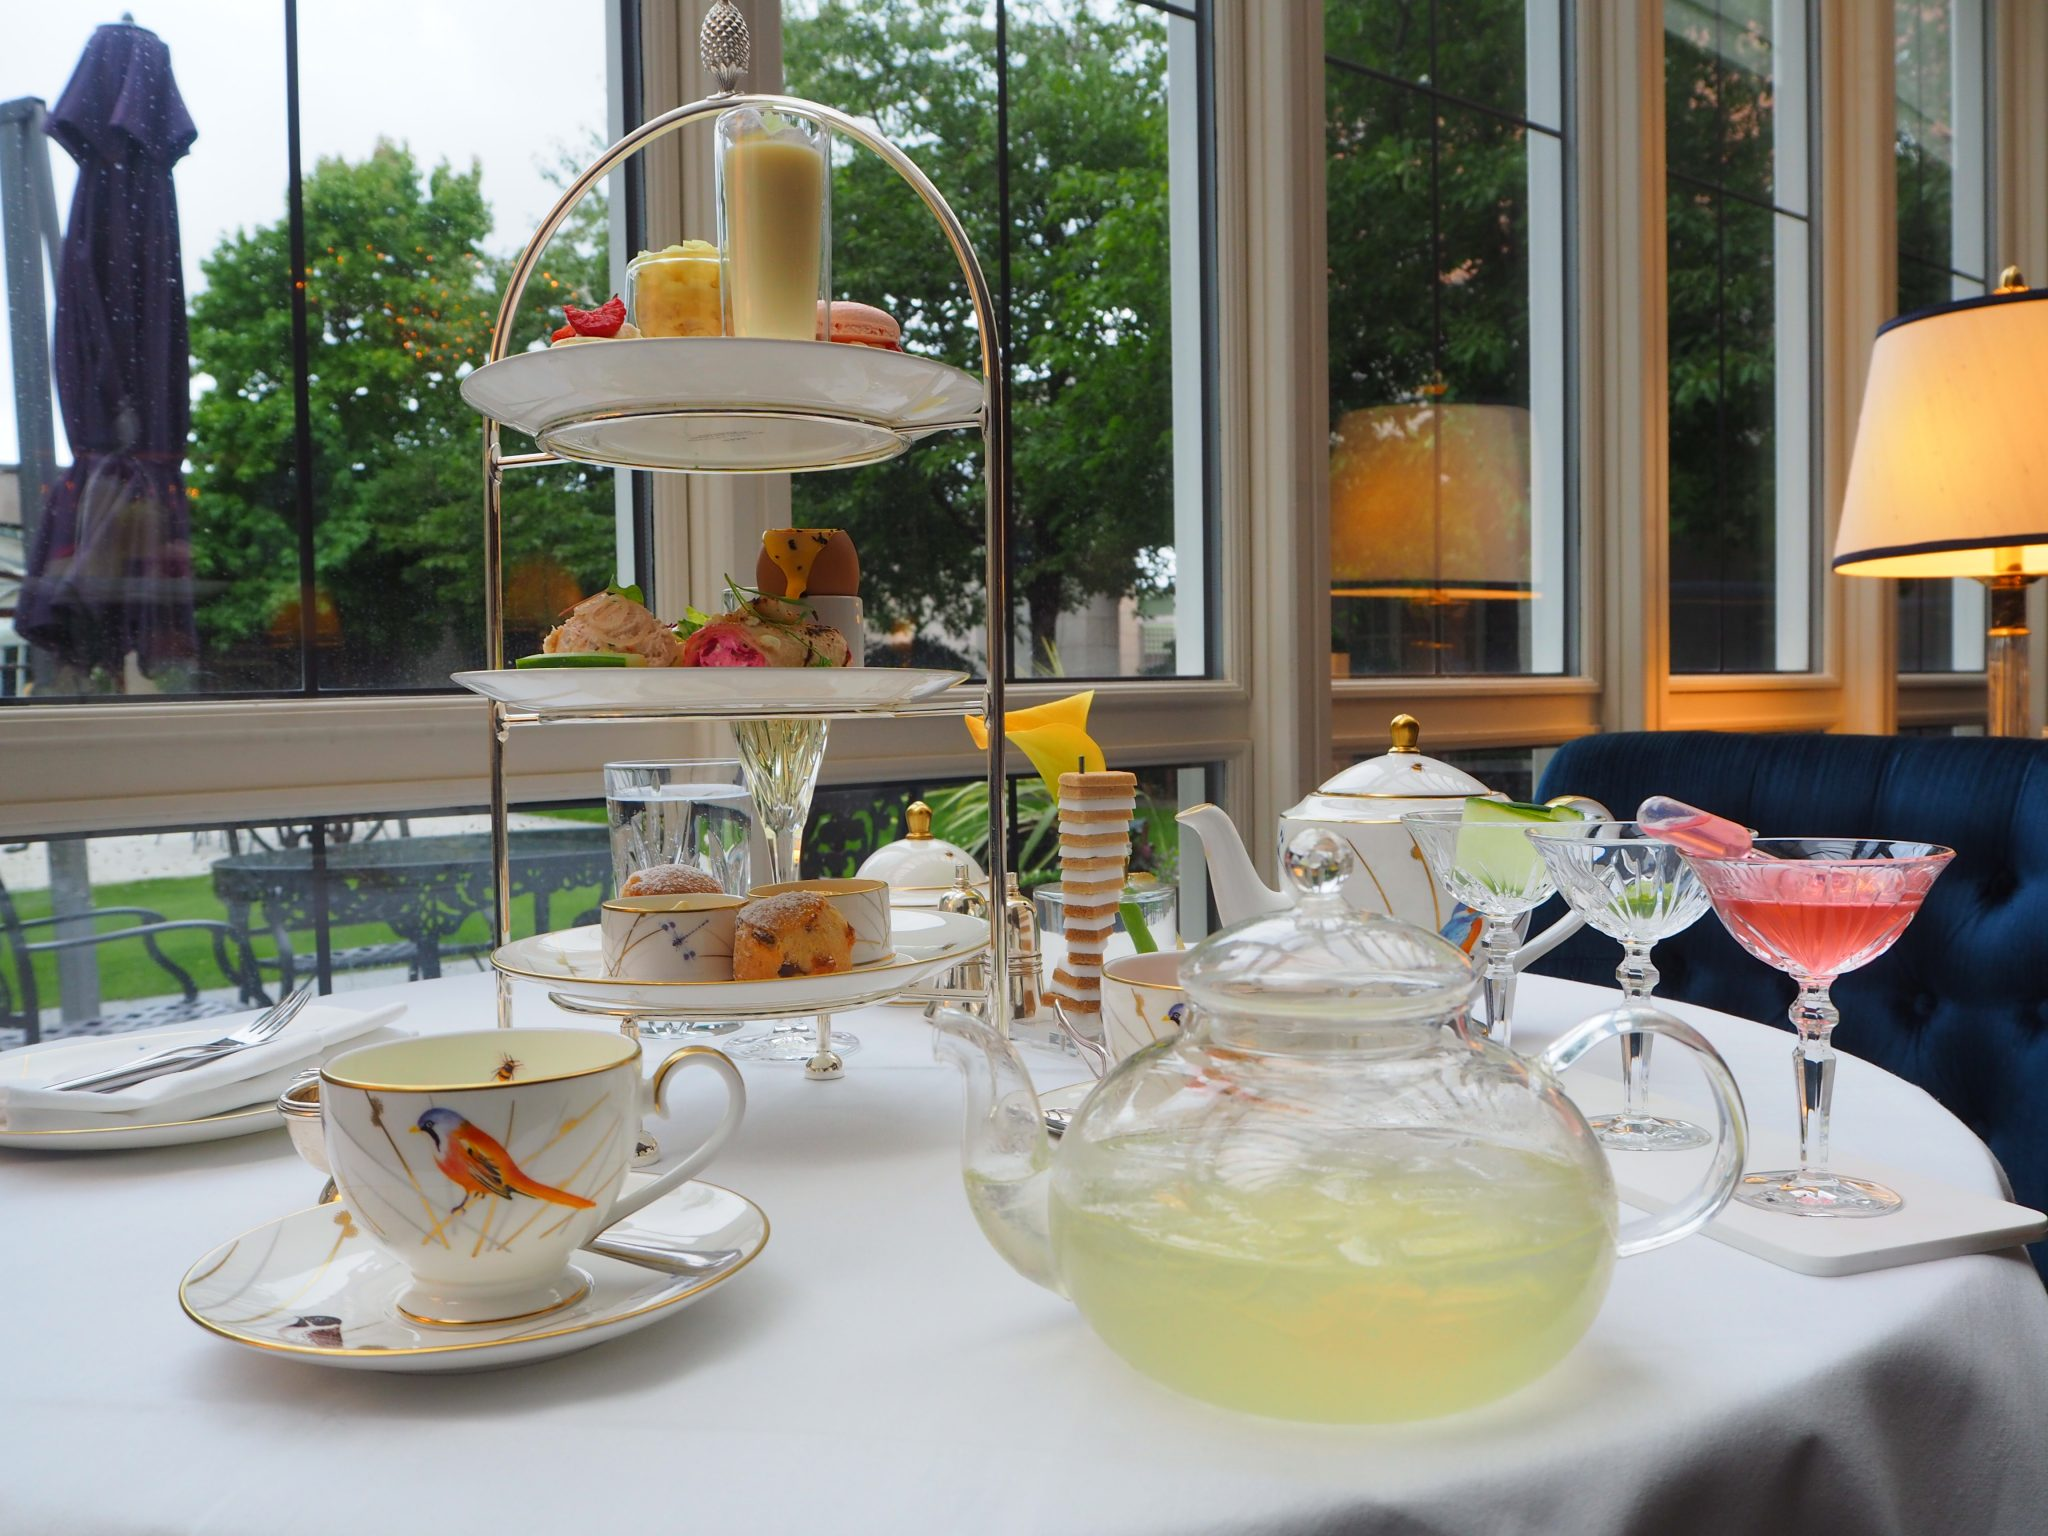 Gin Afternoon Tea / G&Tea at the InterContinental Dublin